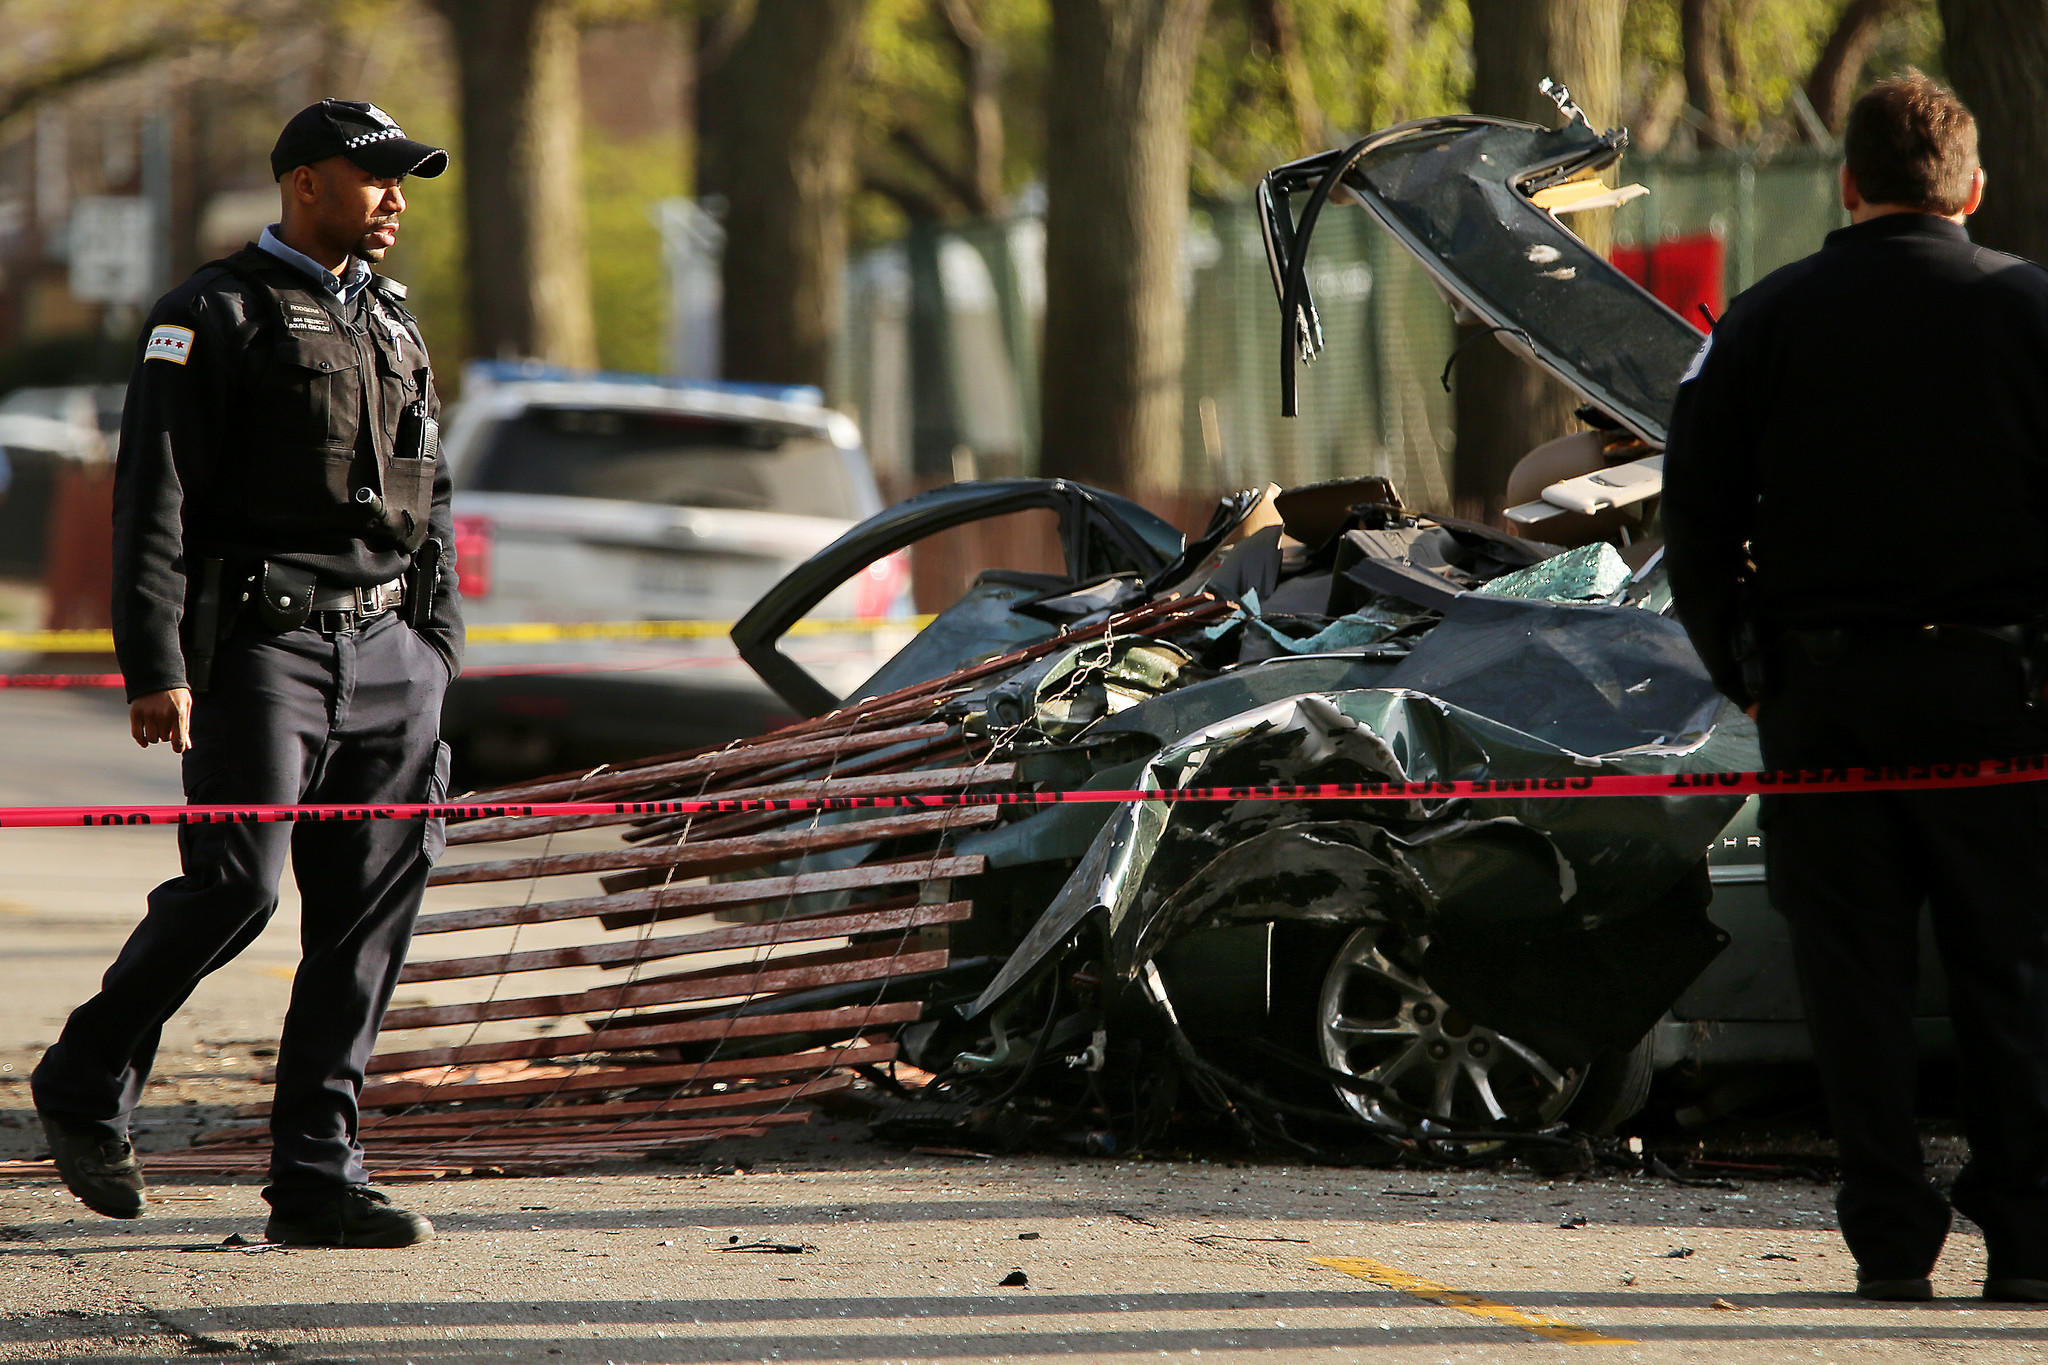 1 killed 1 hurt in South Side auto accident tribunedigital